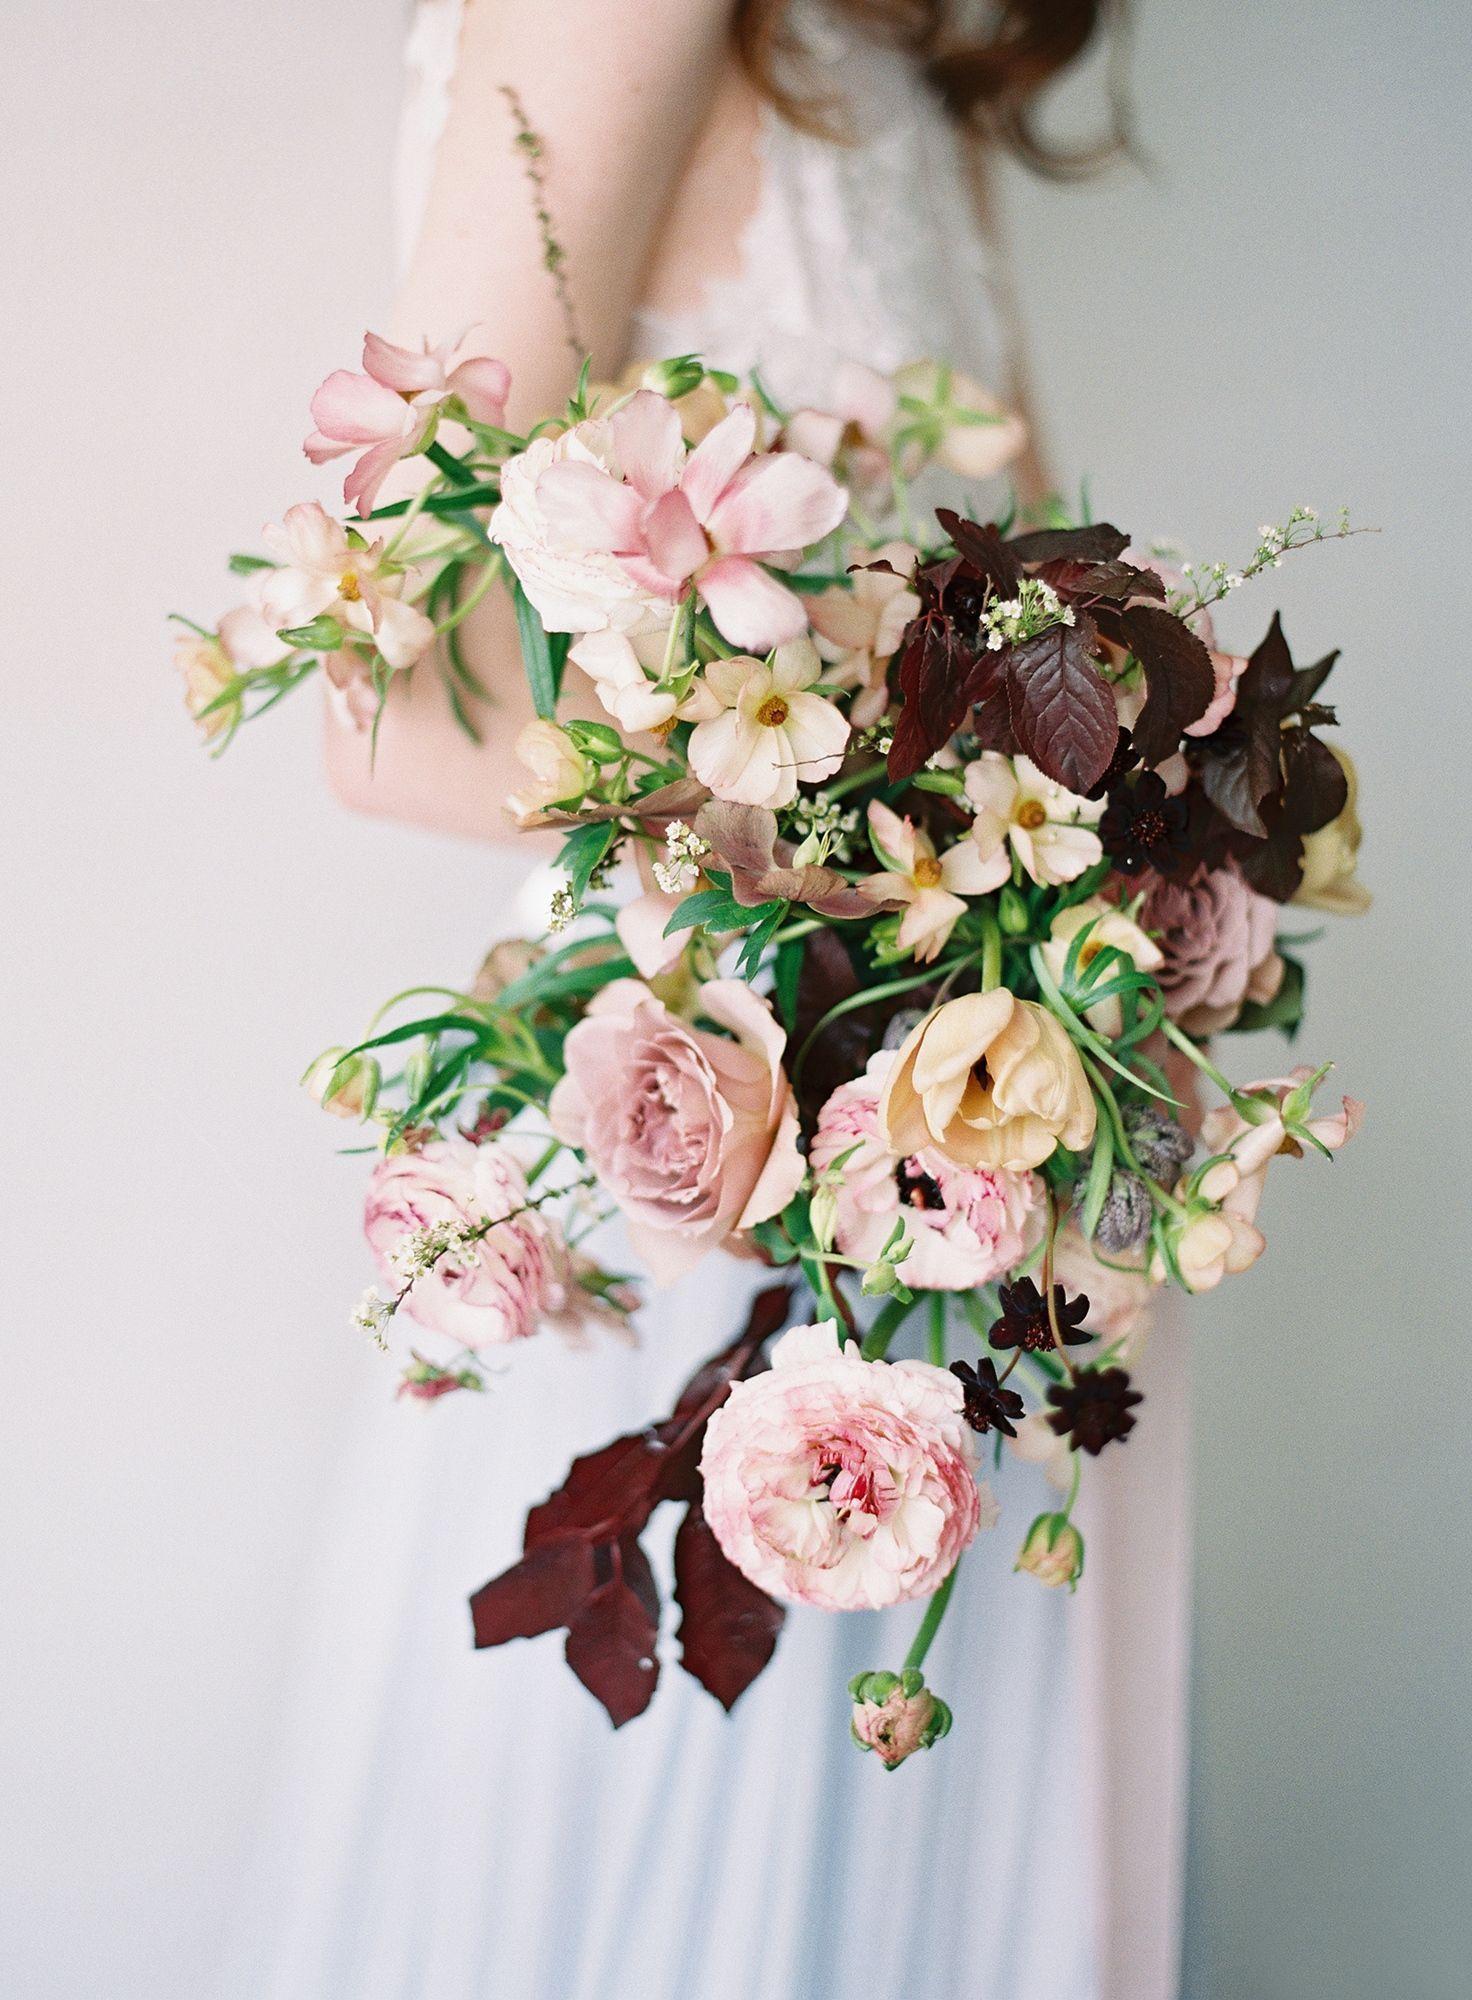 20 Of The Most Beautiful Fall Wedding Flower Arrangements Fall